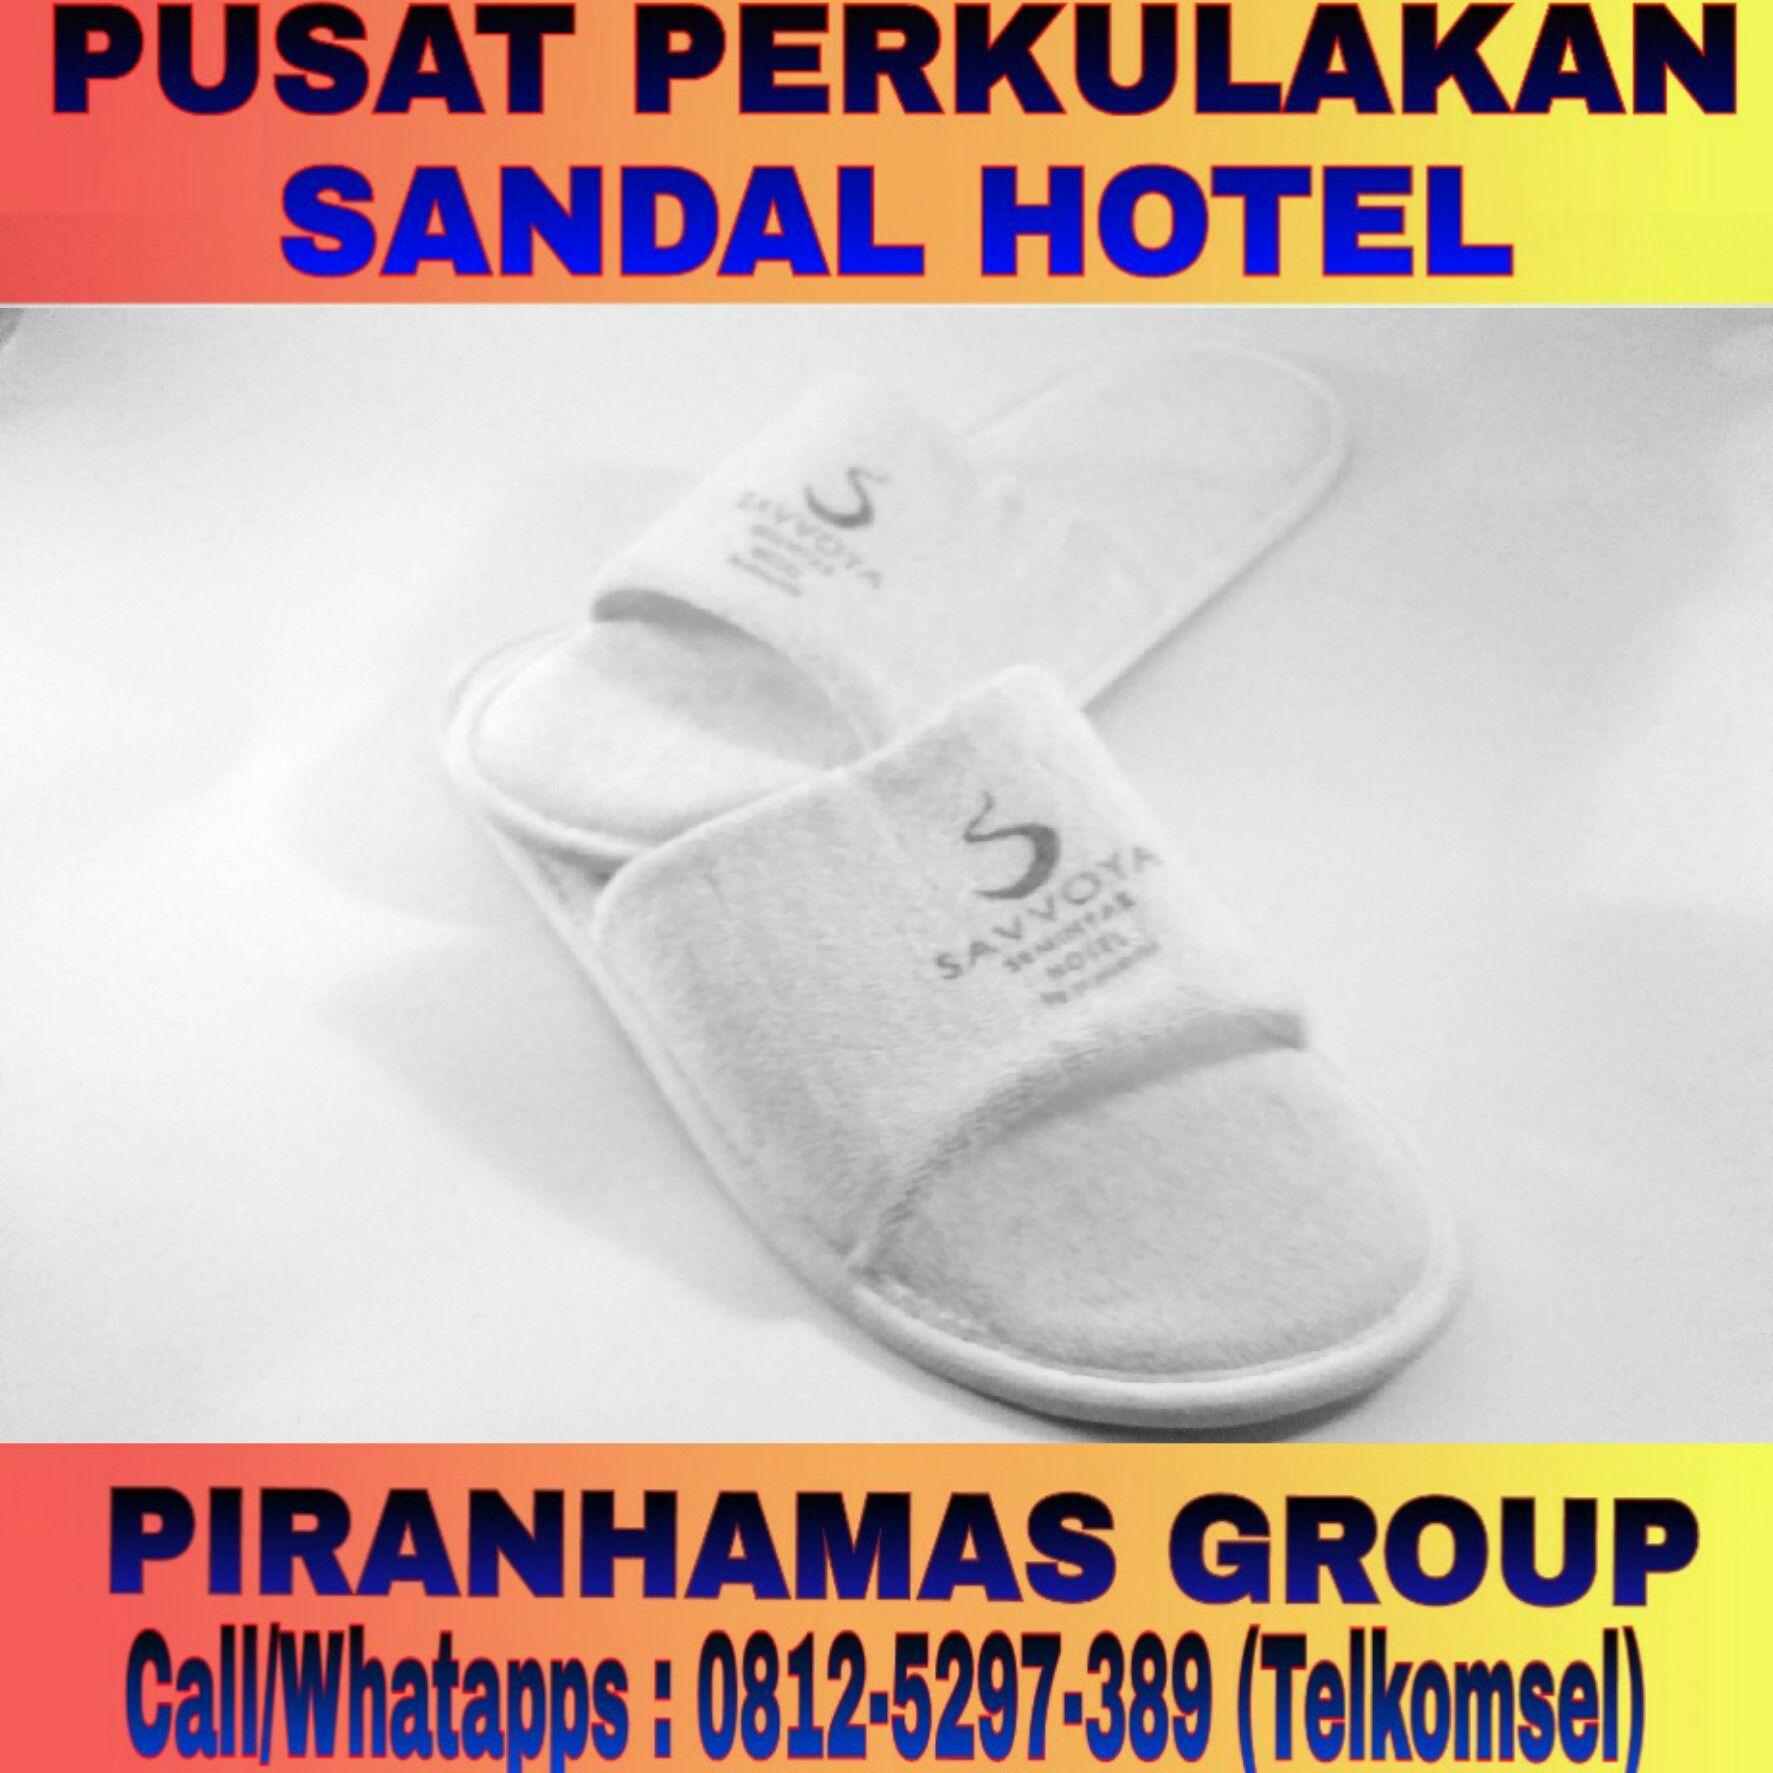 Pengrajin Sandal Hotel Perusahan Amenities Produsen Pusat